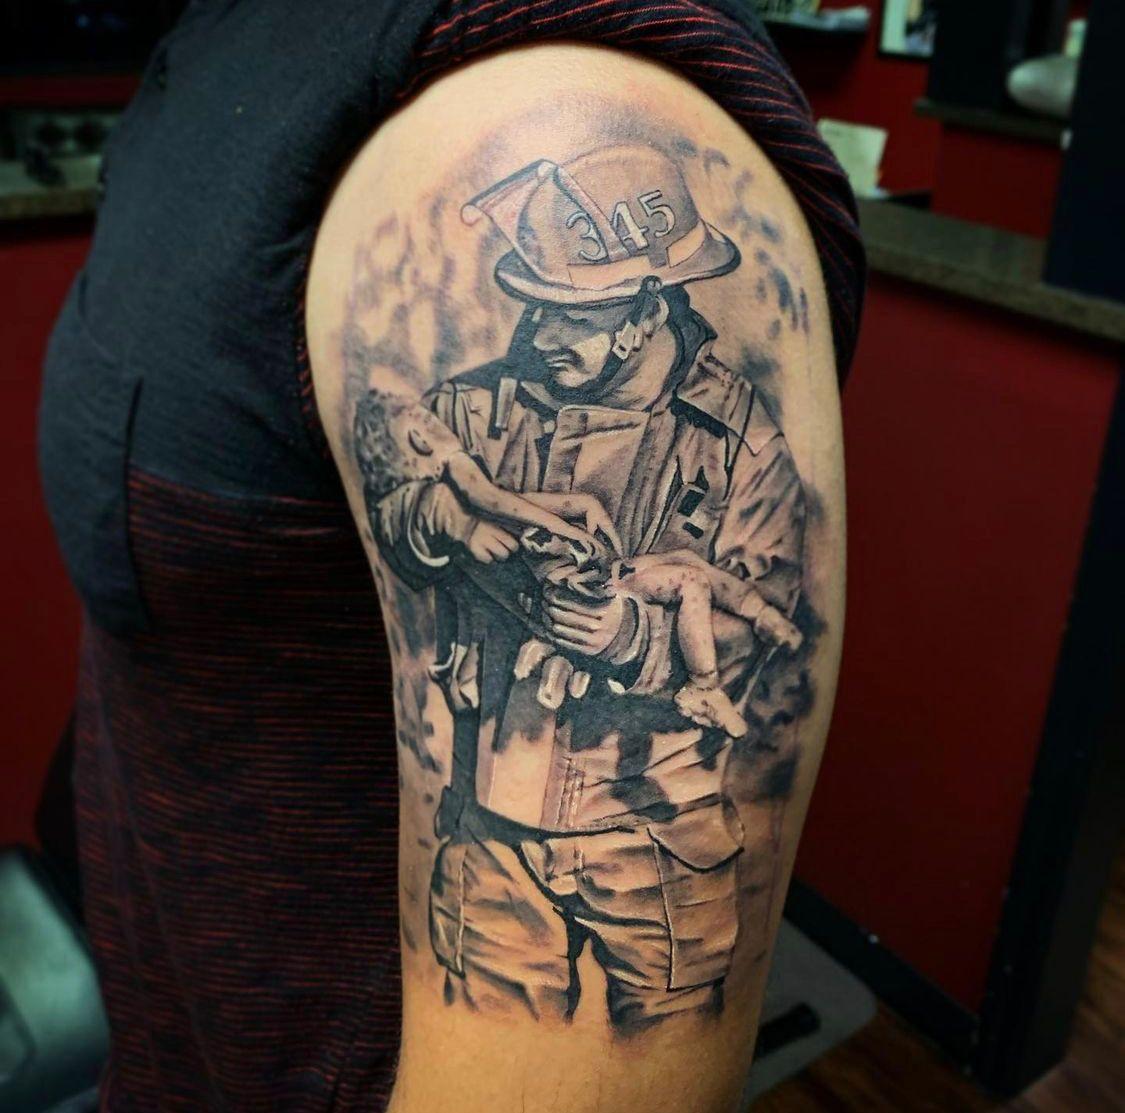 Raul Hand tattoo